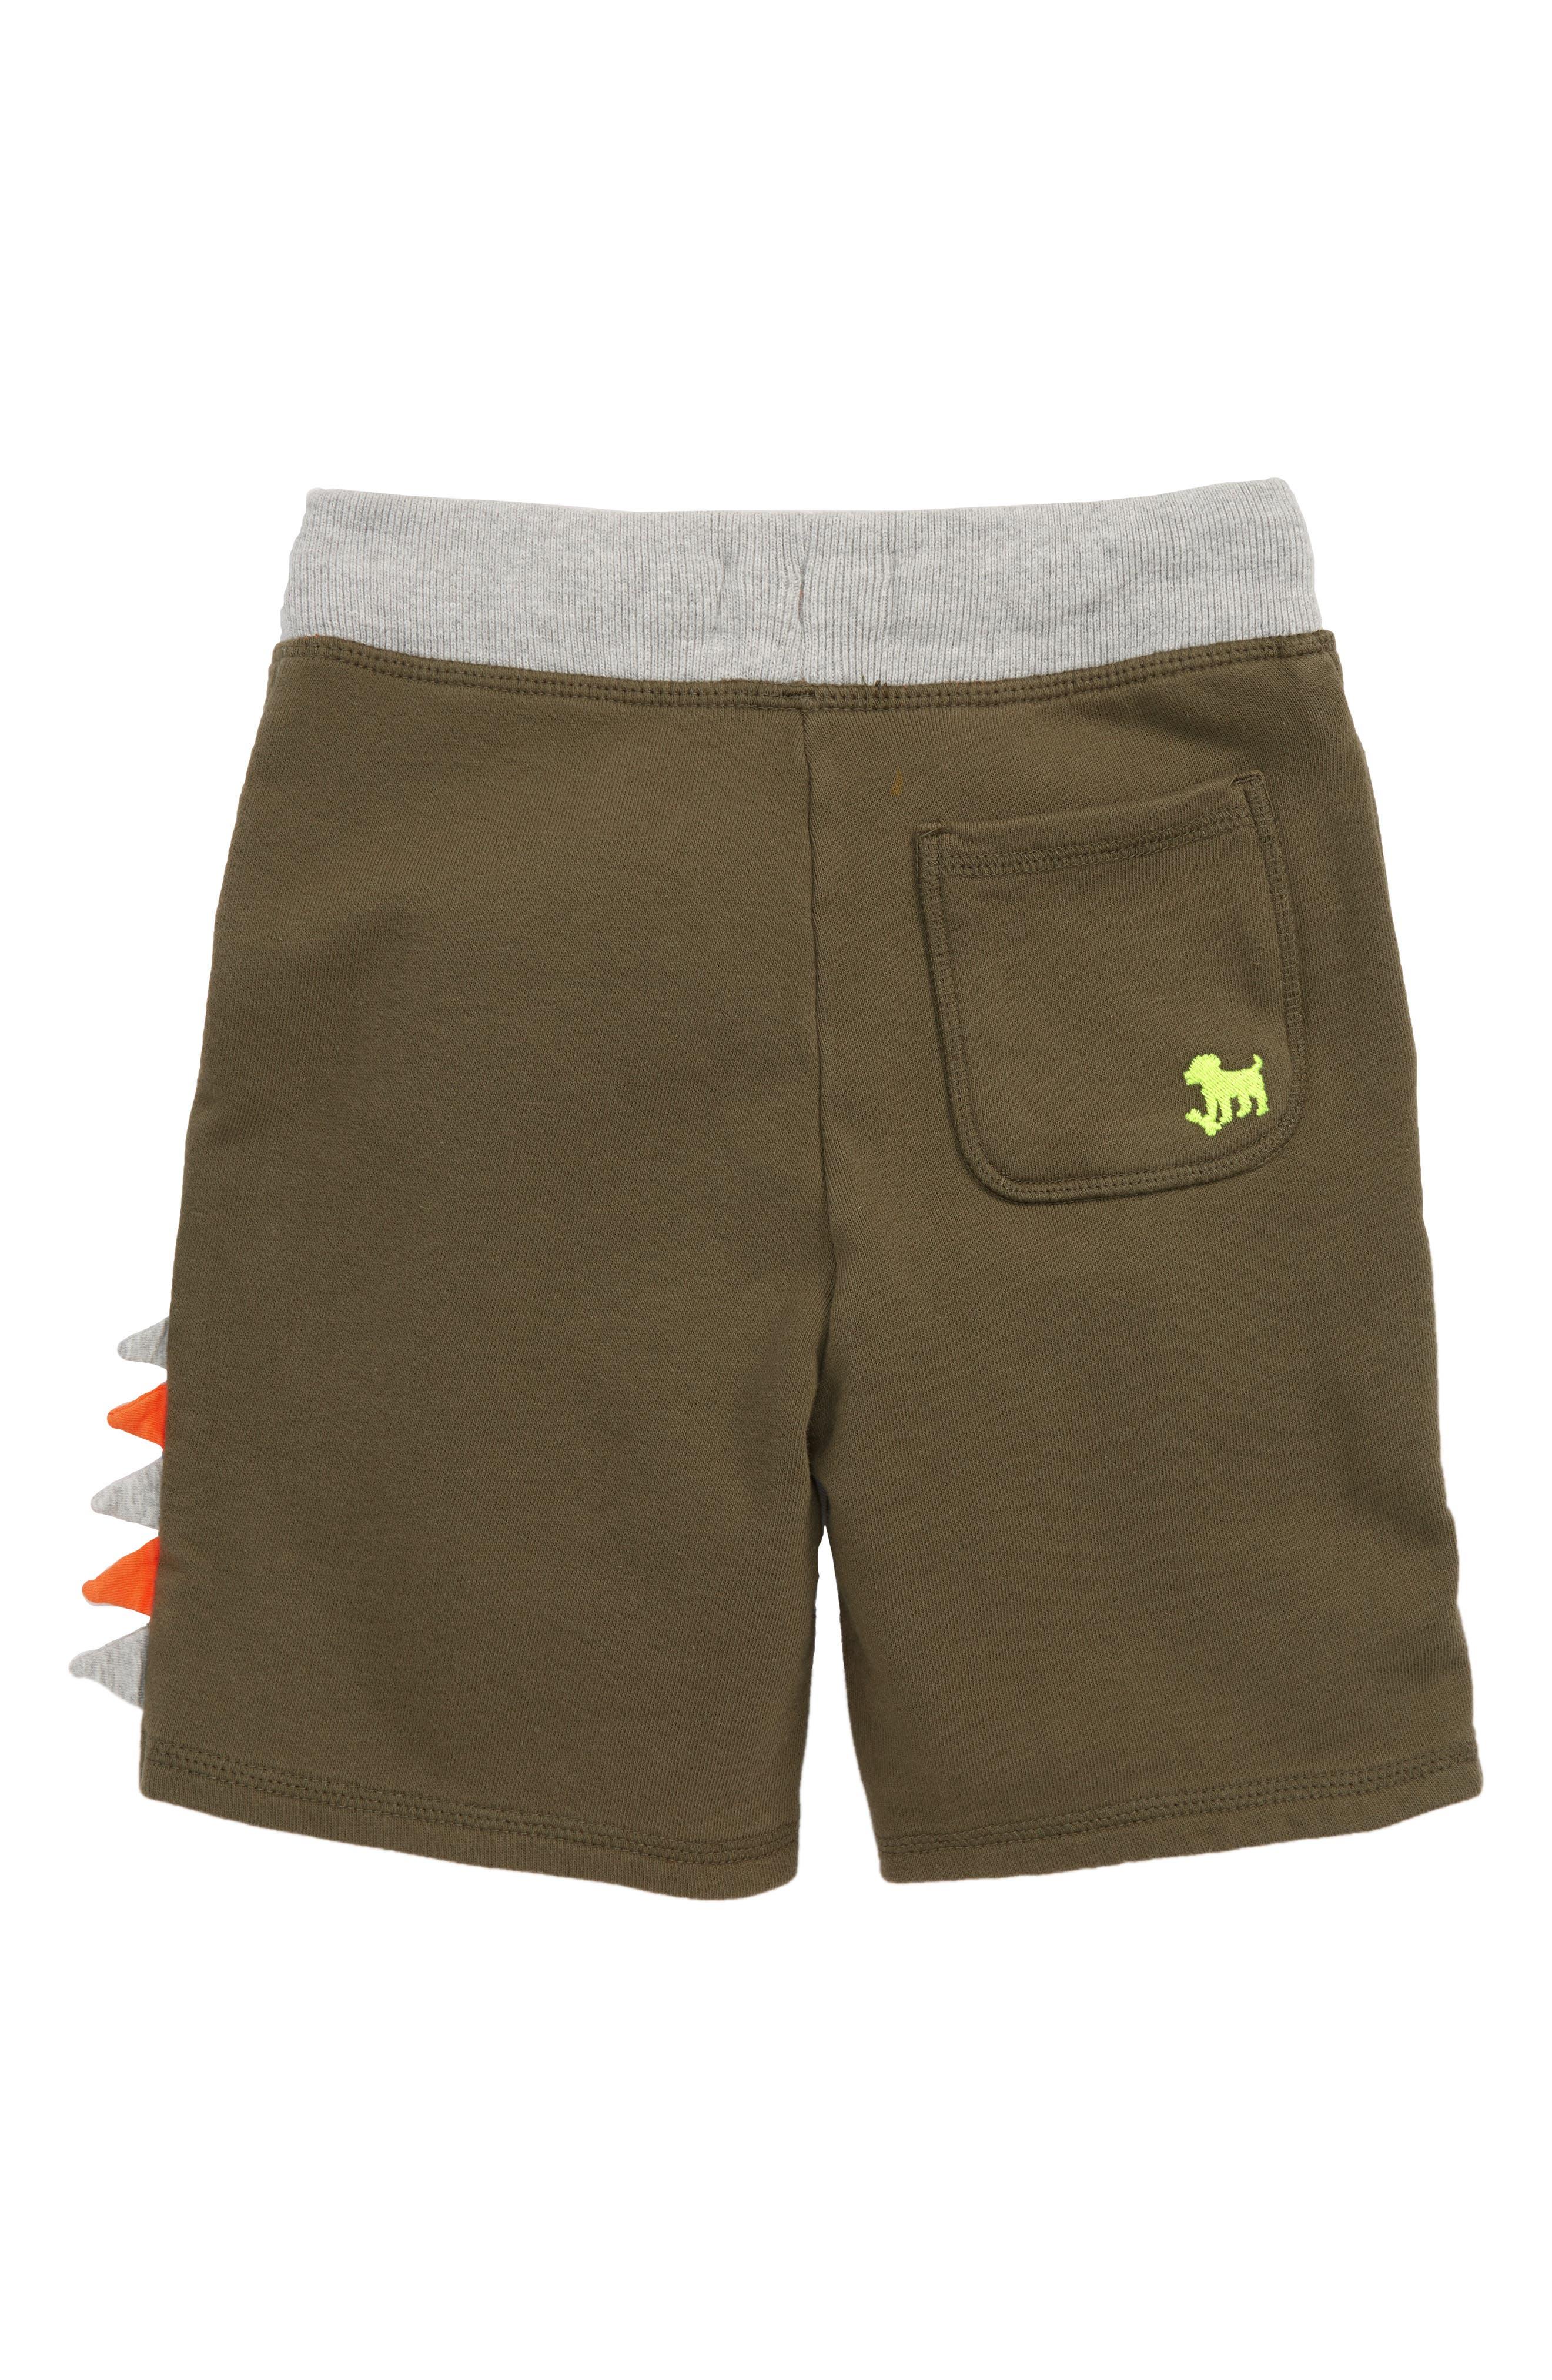 Alternate Image 2  - Mini Boden Iguana Appliqué Sweatshorts (Toddler Boys, Little Boys & Big Boys)